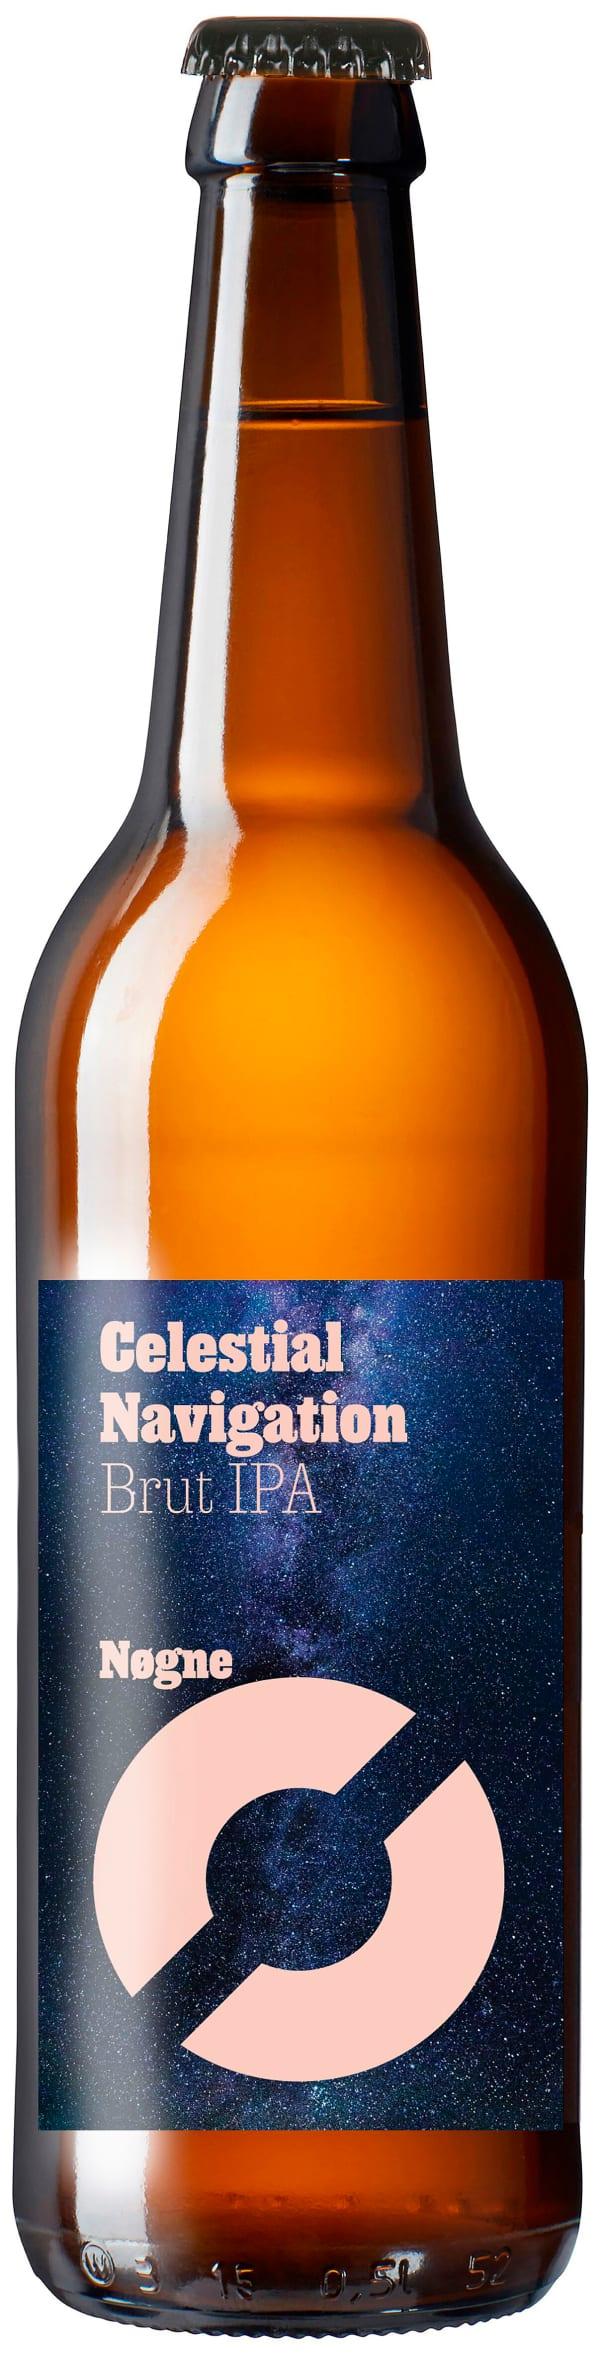 Nøgne Ø Celestial Navigation Brut IPA